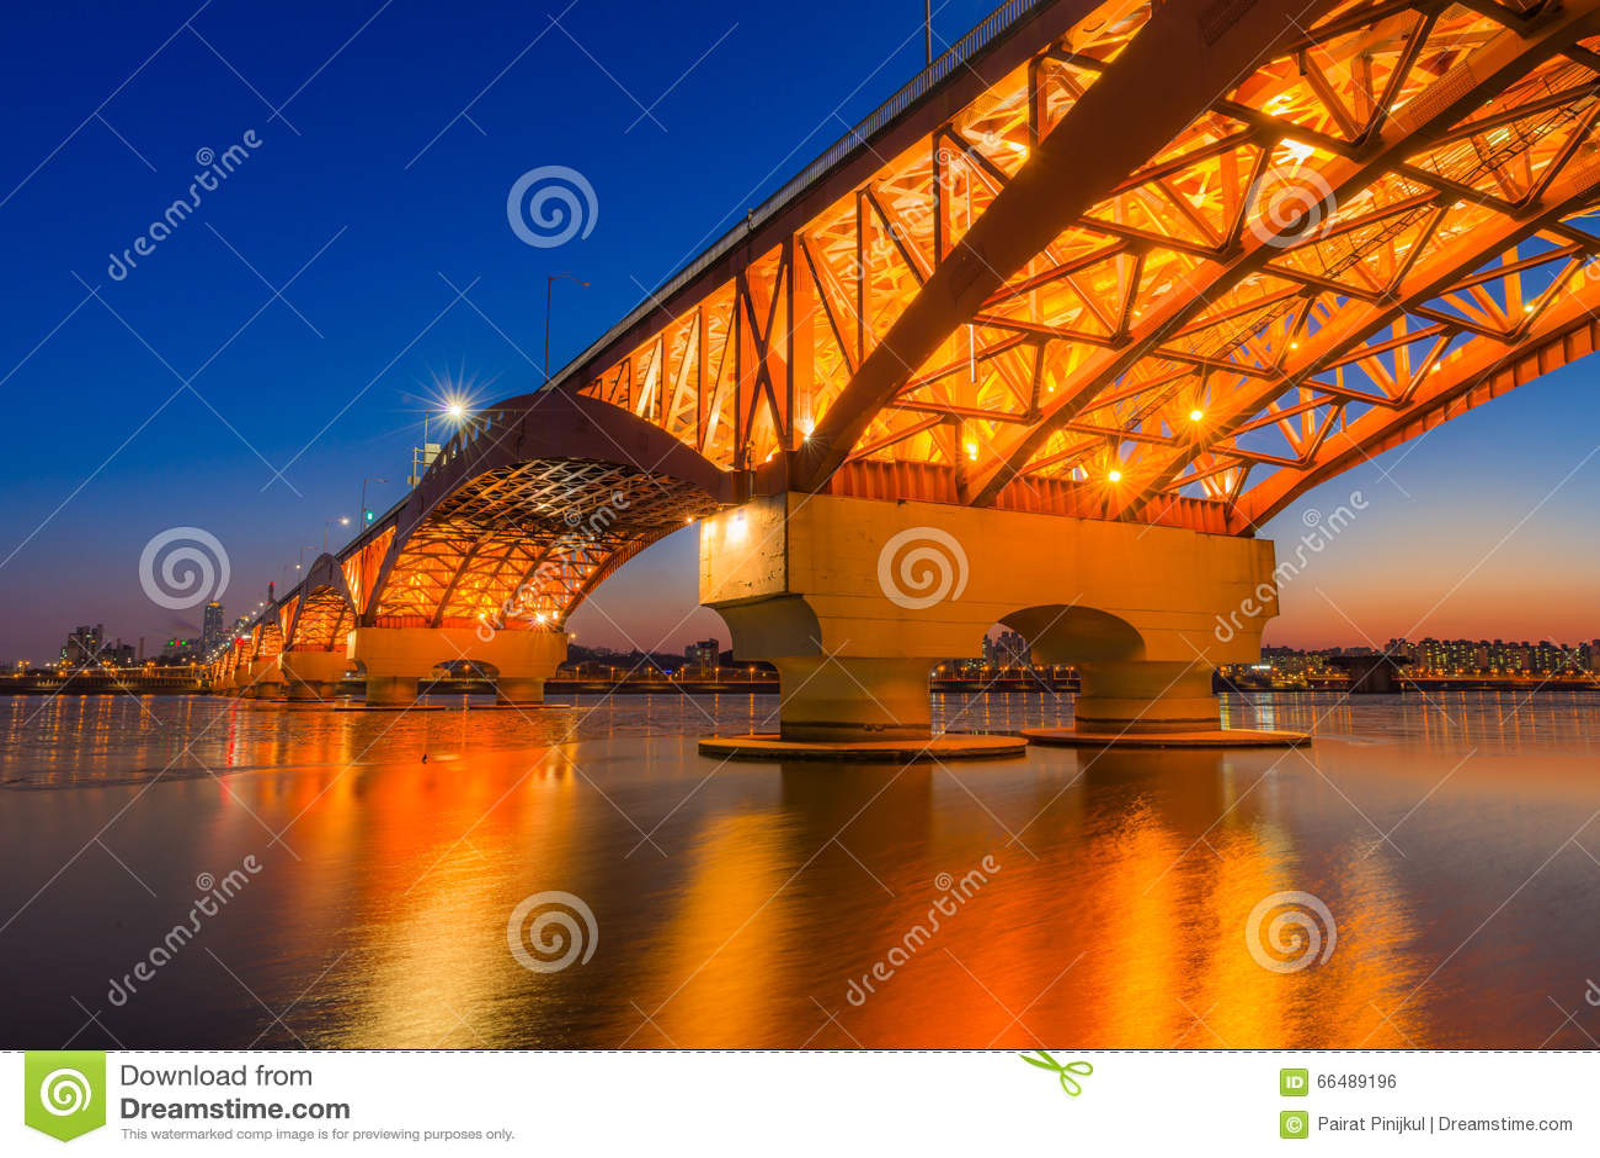 Han river with Seongsan bridge at night in Seoul, Korea/Seongsan Bridge at night/Han river with Seongsan bridge at night in Seoul